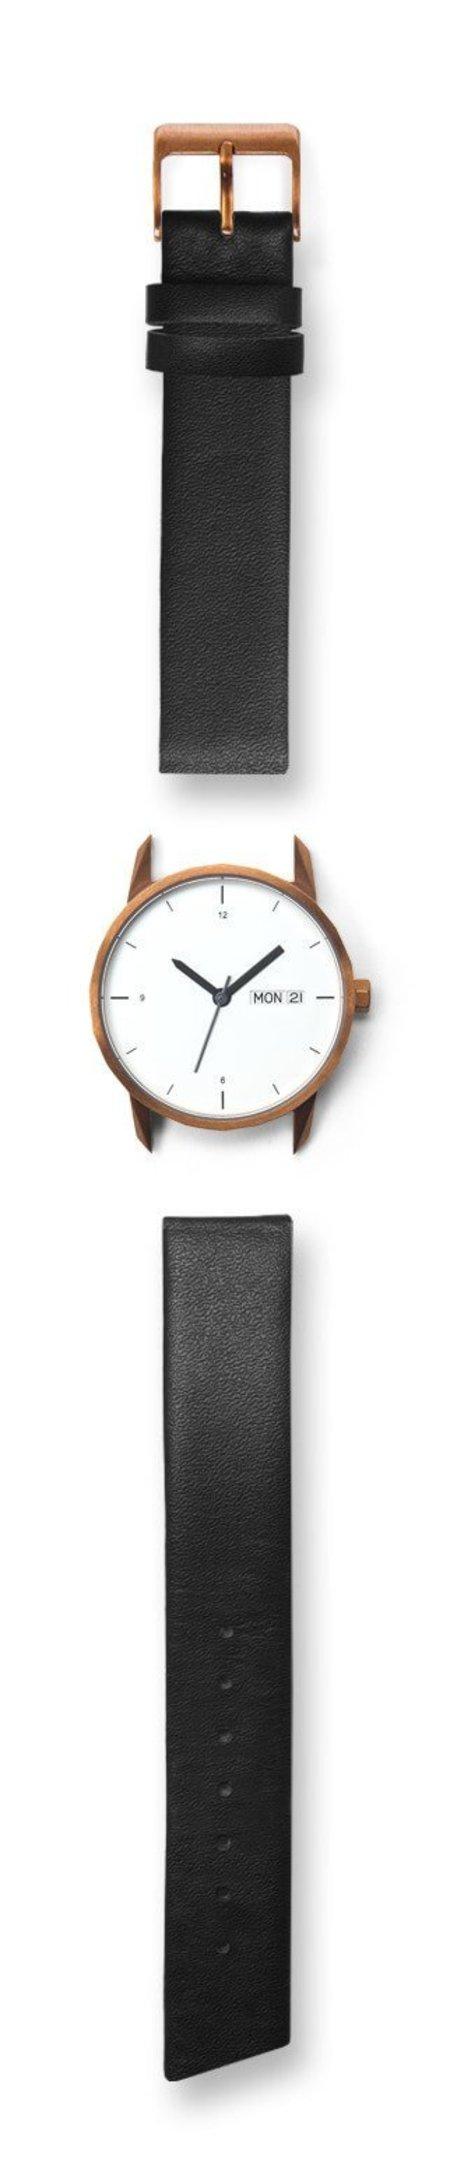 Tinker Watches 34mm Copper Watch Black Standard Strap